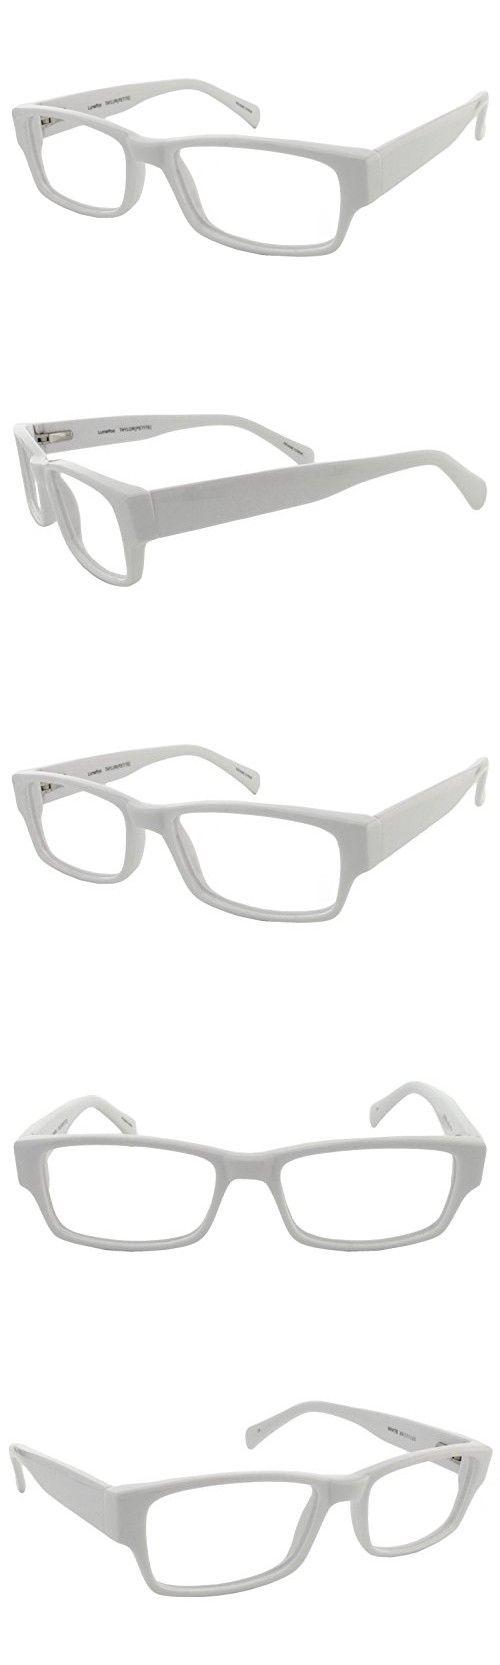 Lunettos Taylor Petite 49 Womens Eyeglass Frames - White